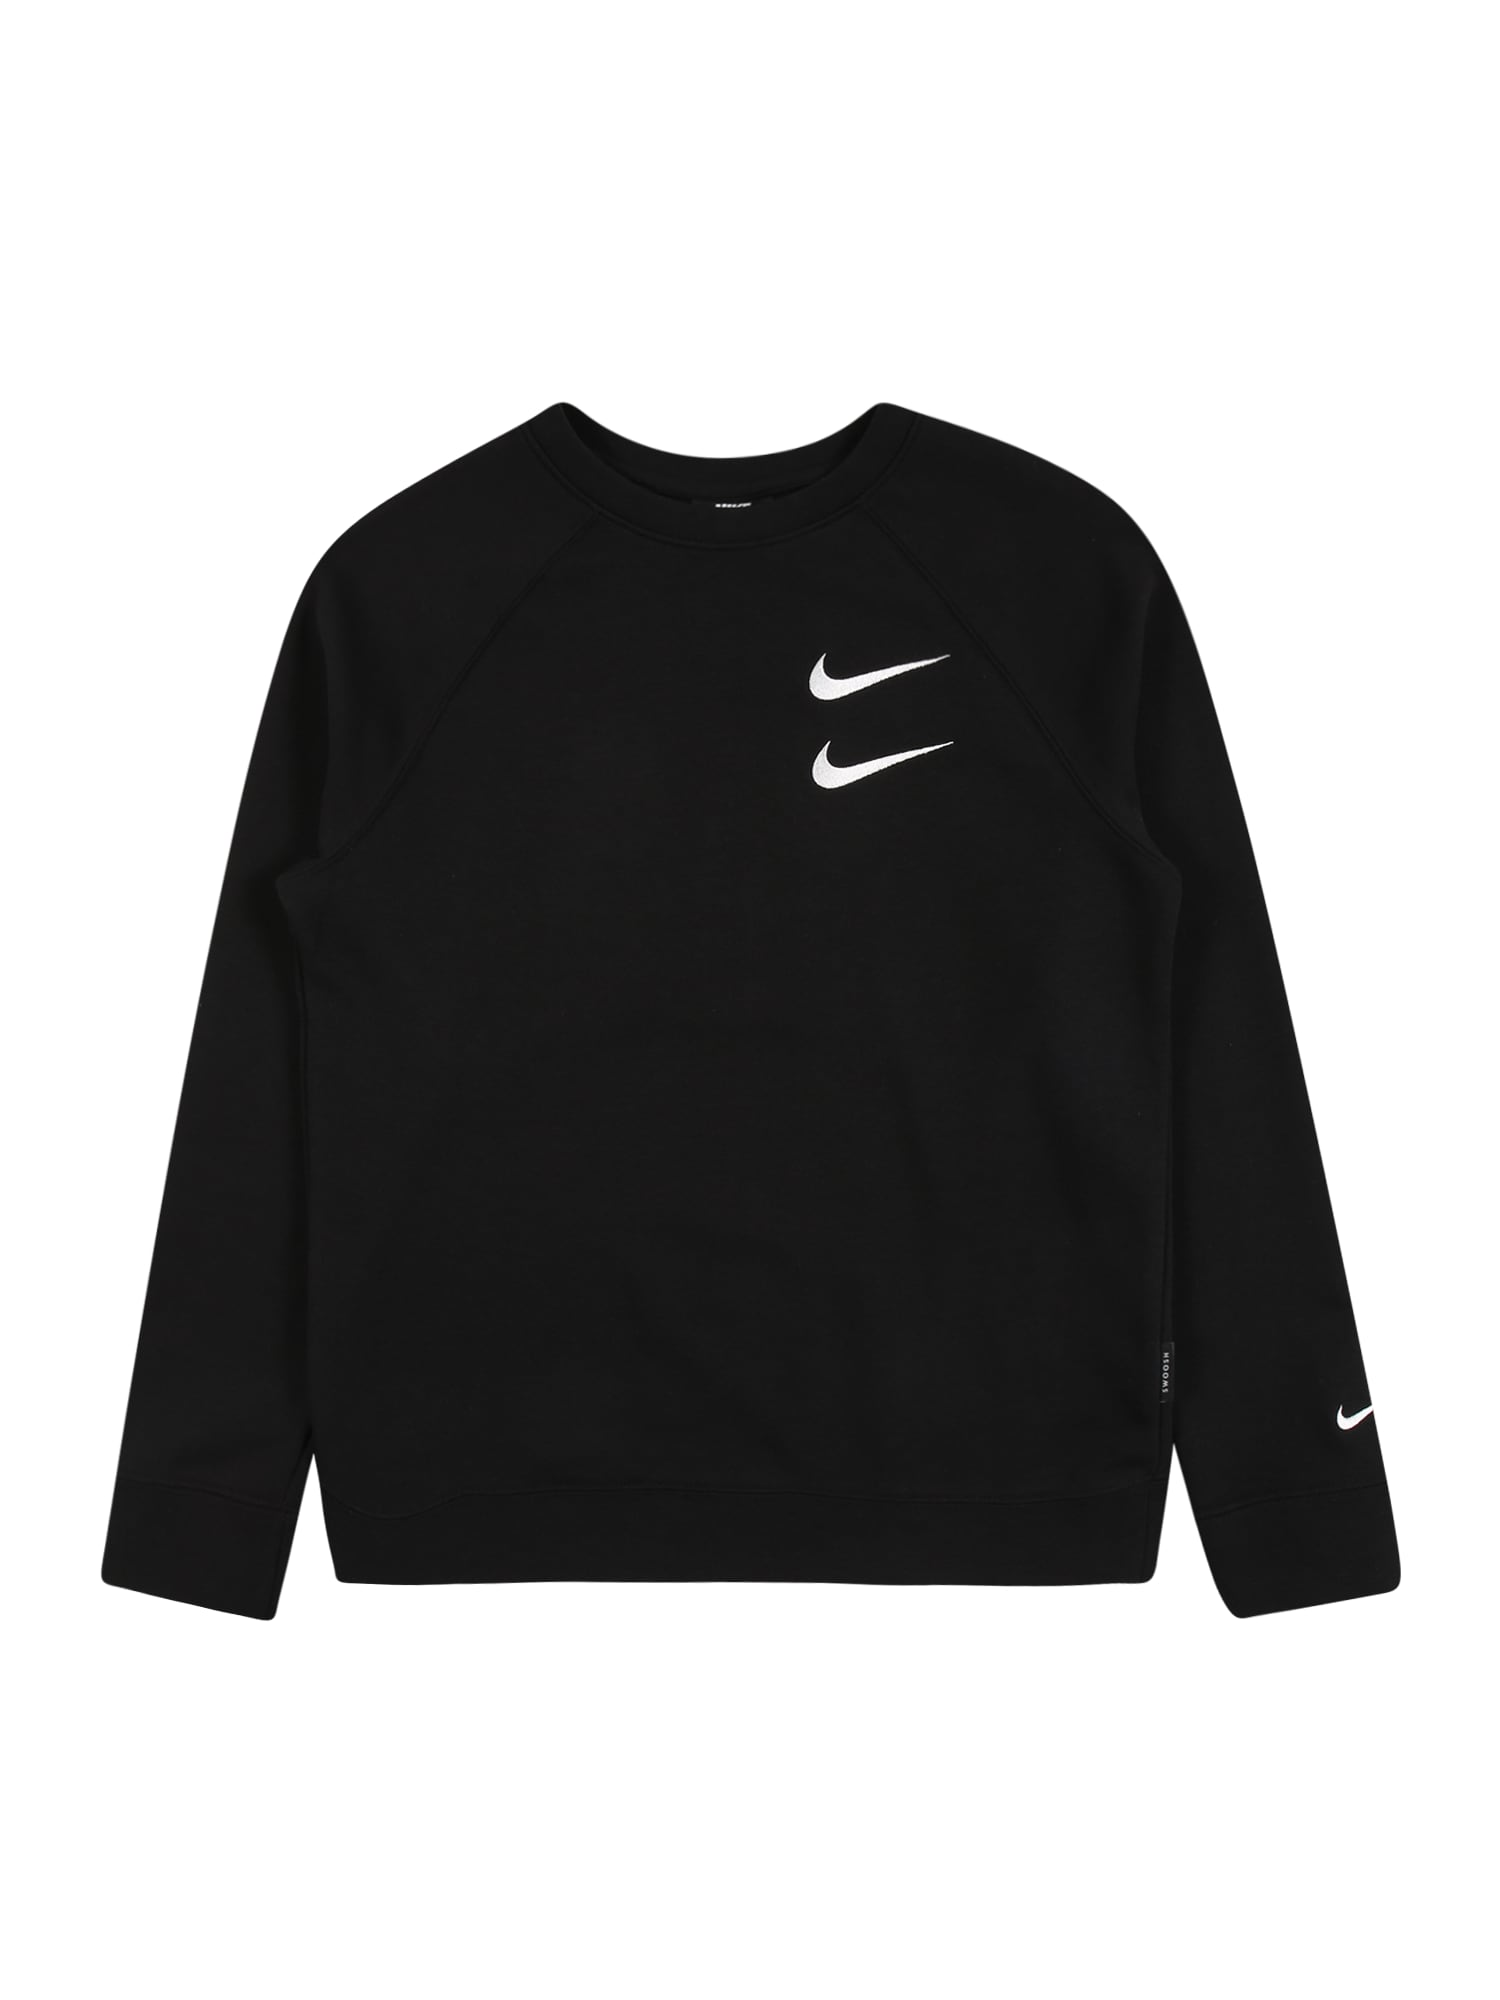 Nike Sportswear Mikina  černá / bílá / tmavě červená